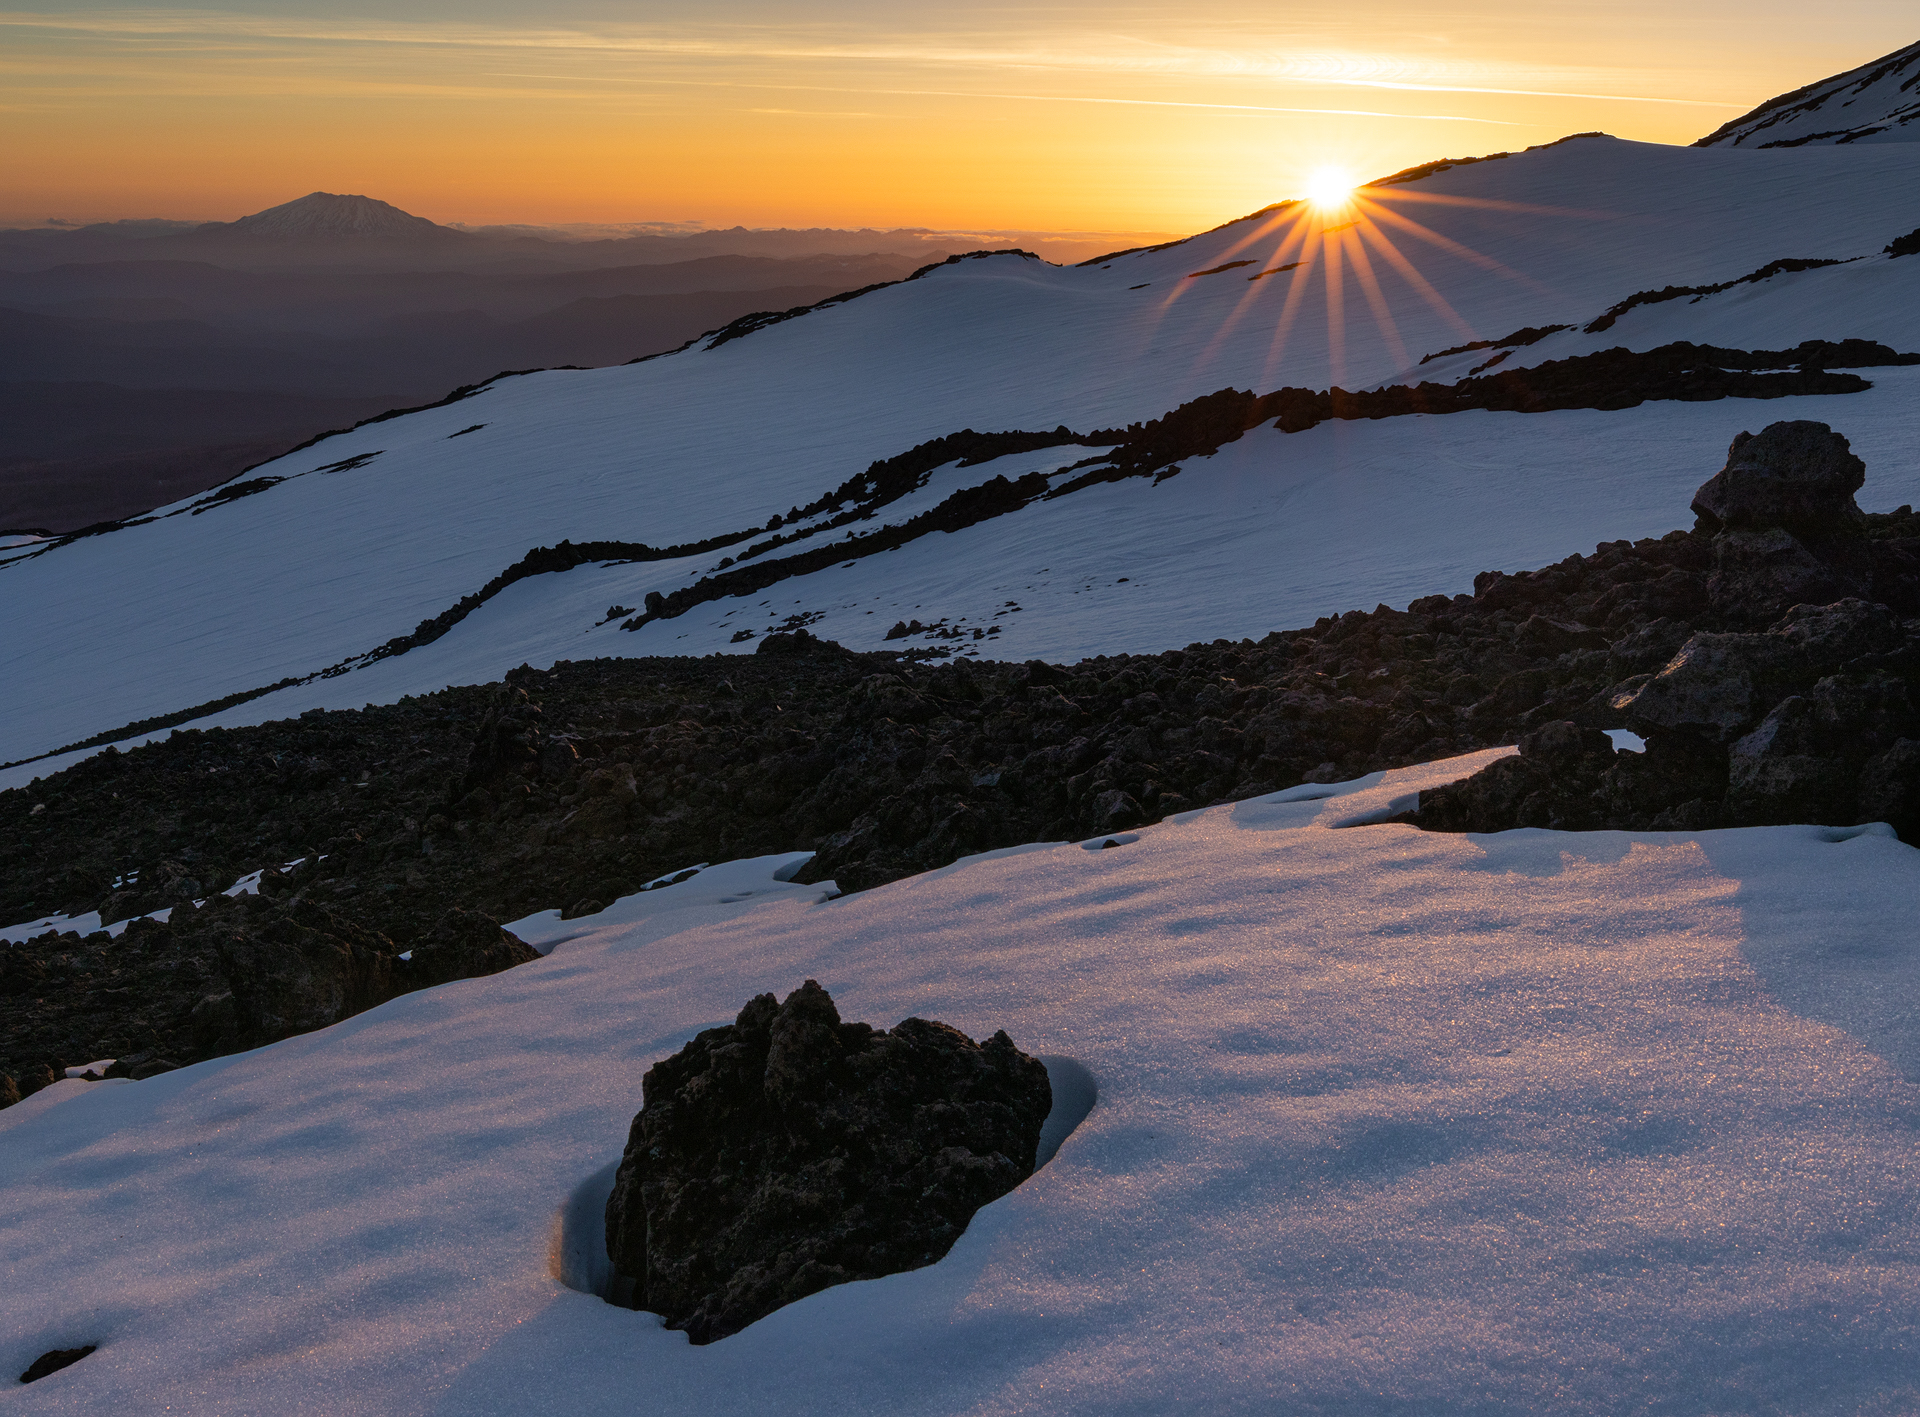 Mt adams sunset-1.jpg